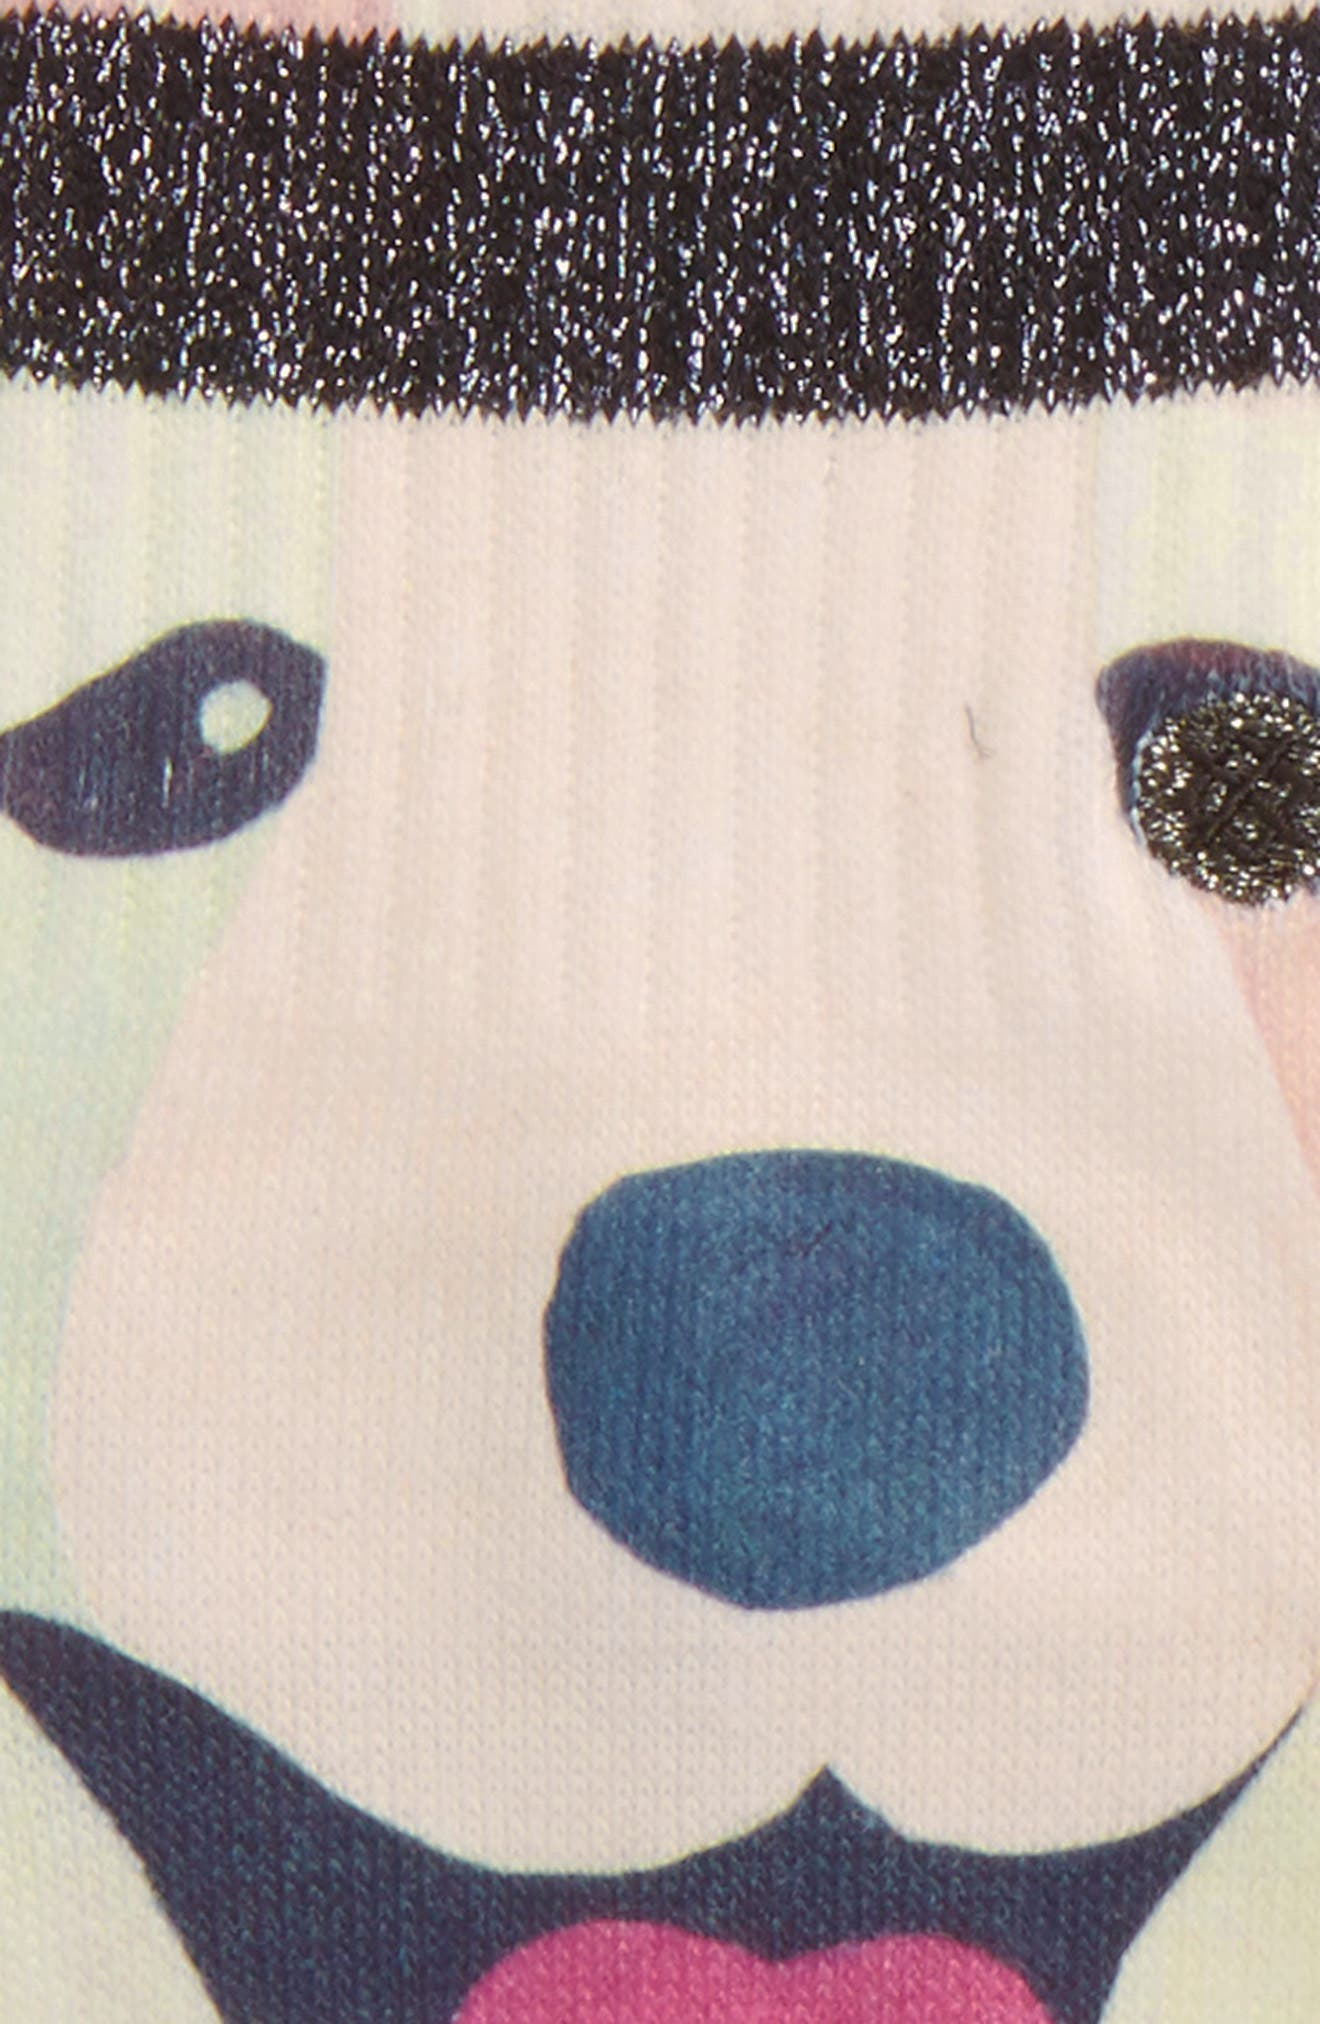 Puppies Crew Socks,                             Alternate thumbnail 2, color,                             001